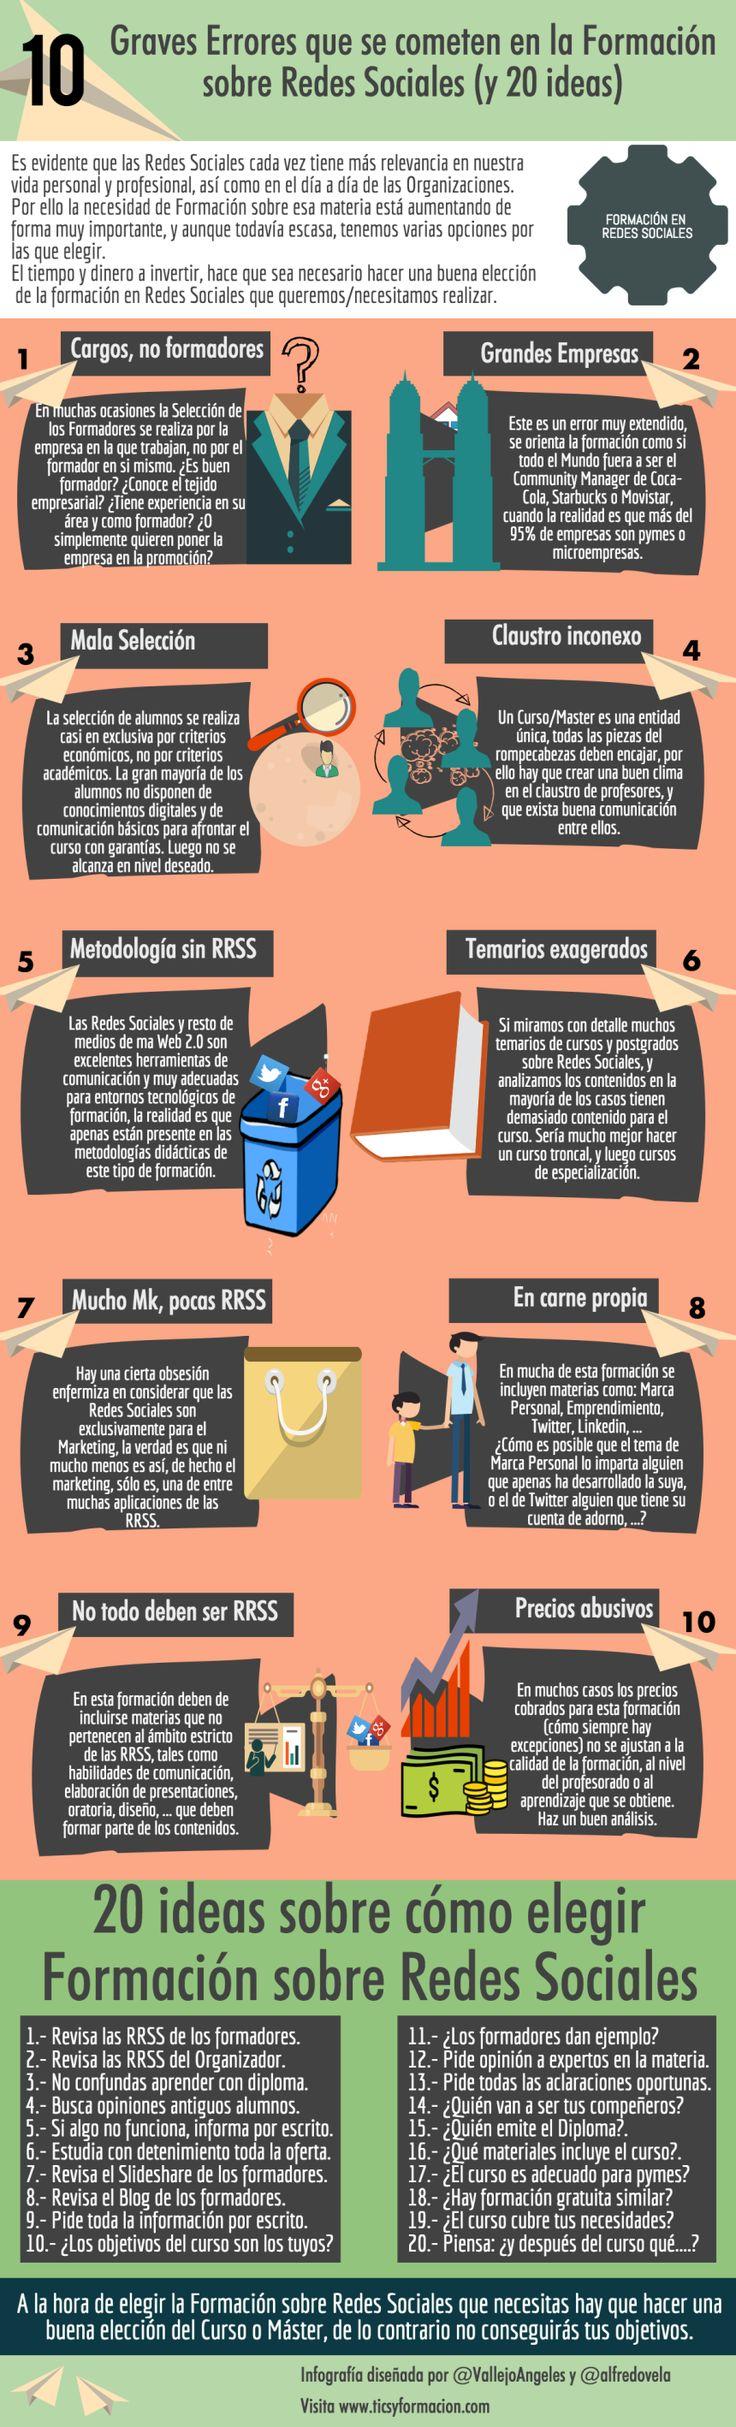 10 graves errores que se cometen en Formación sobre Redes Sociales #infografia